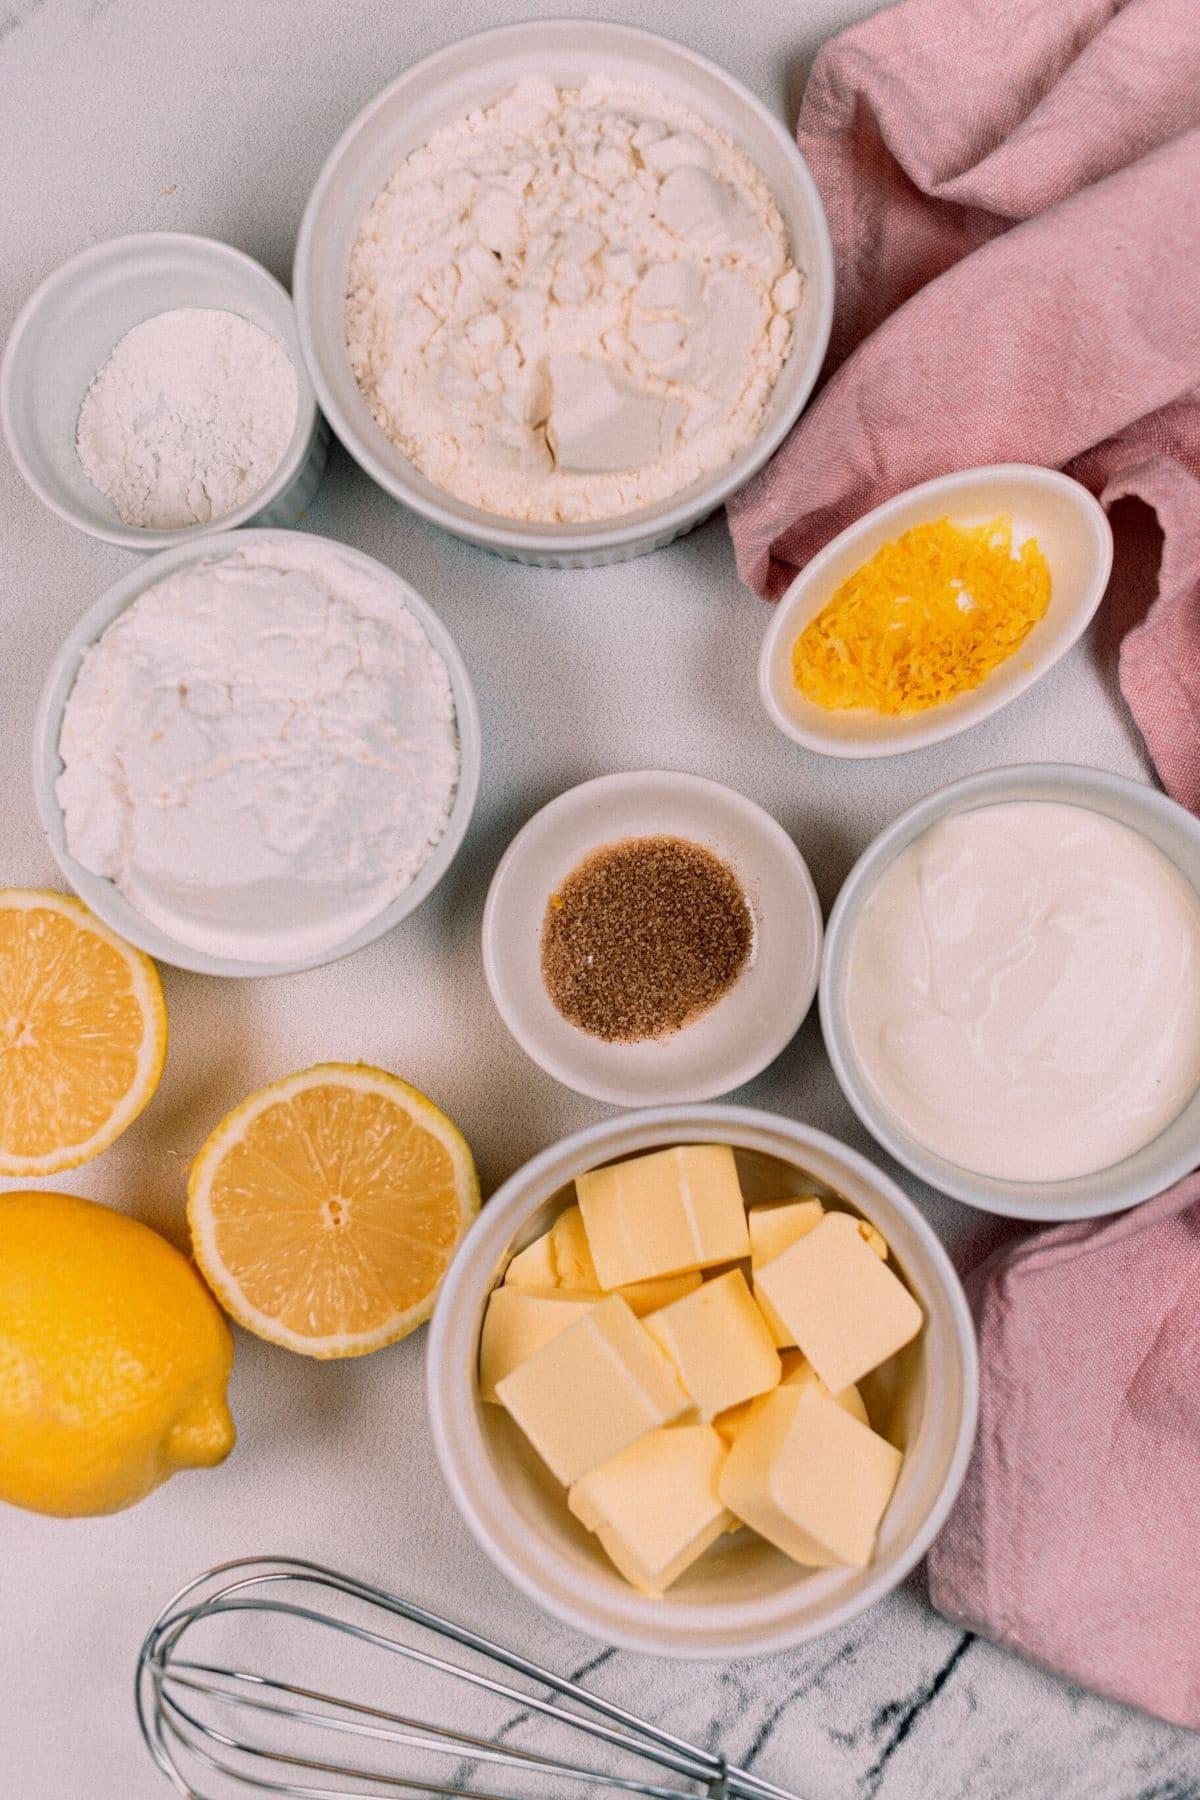 Lermon cookie ingredients